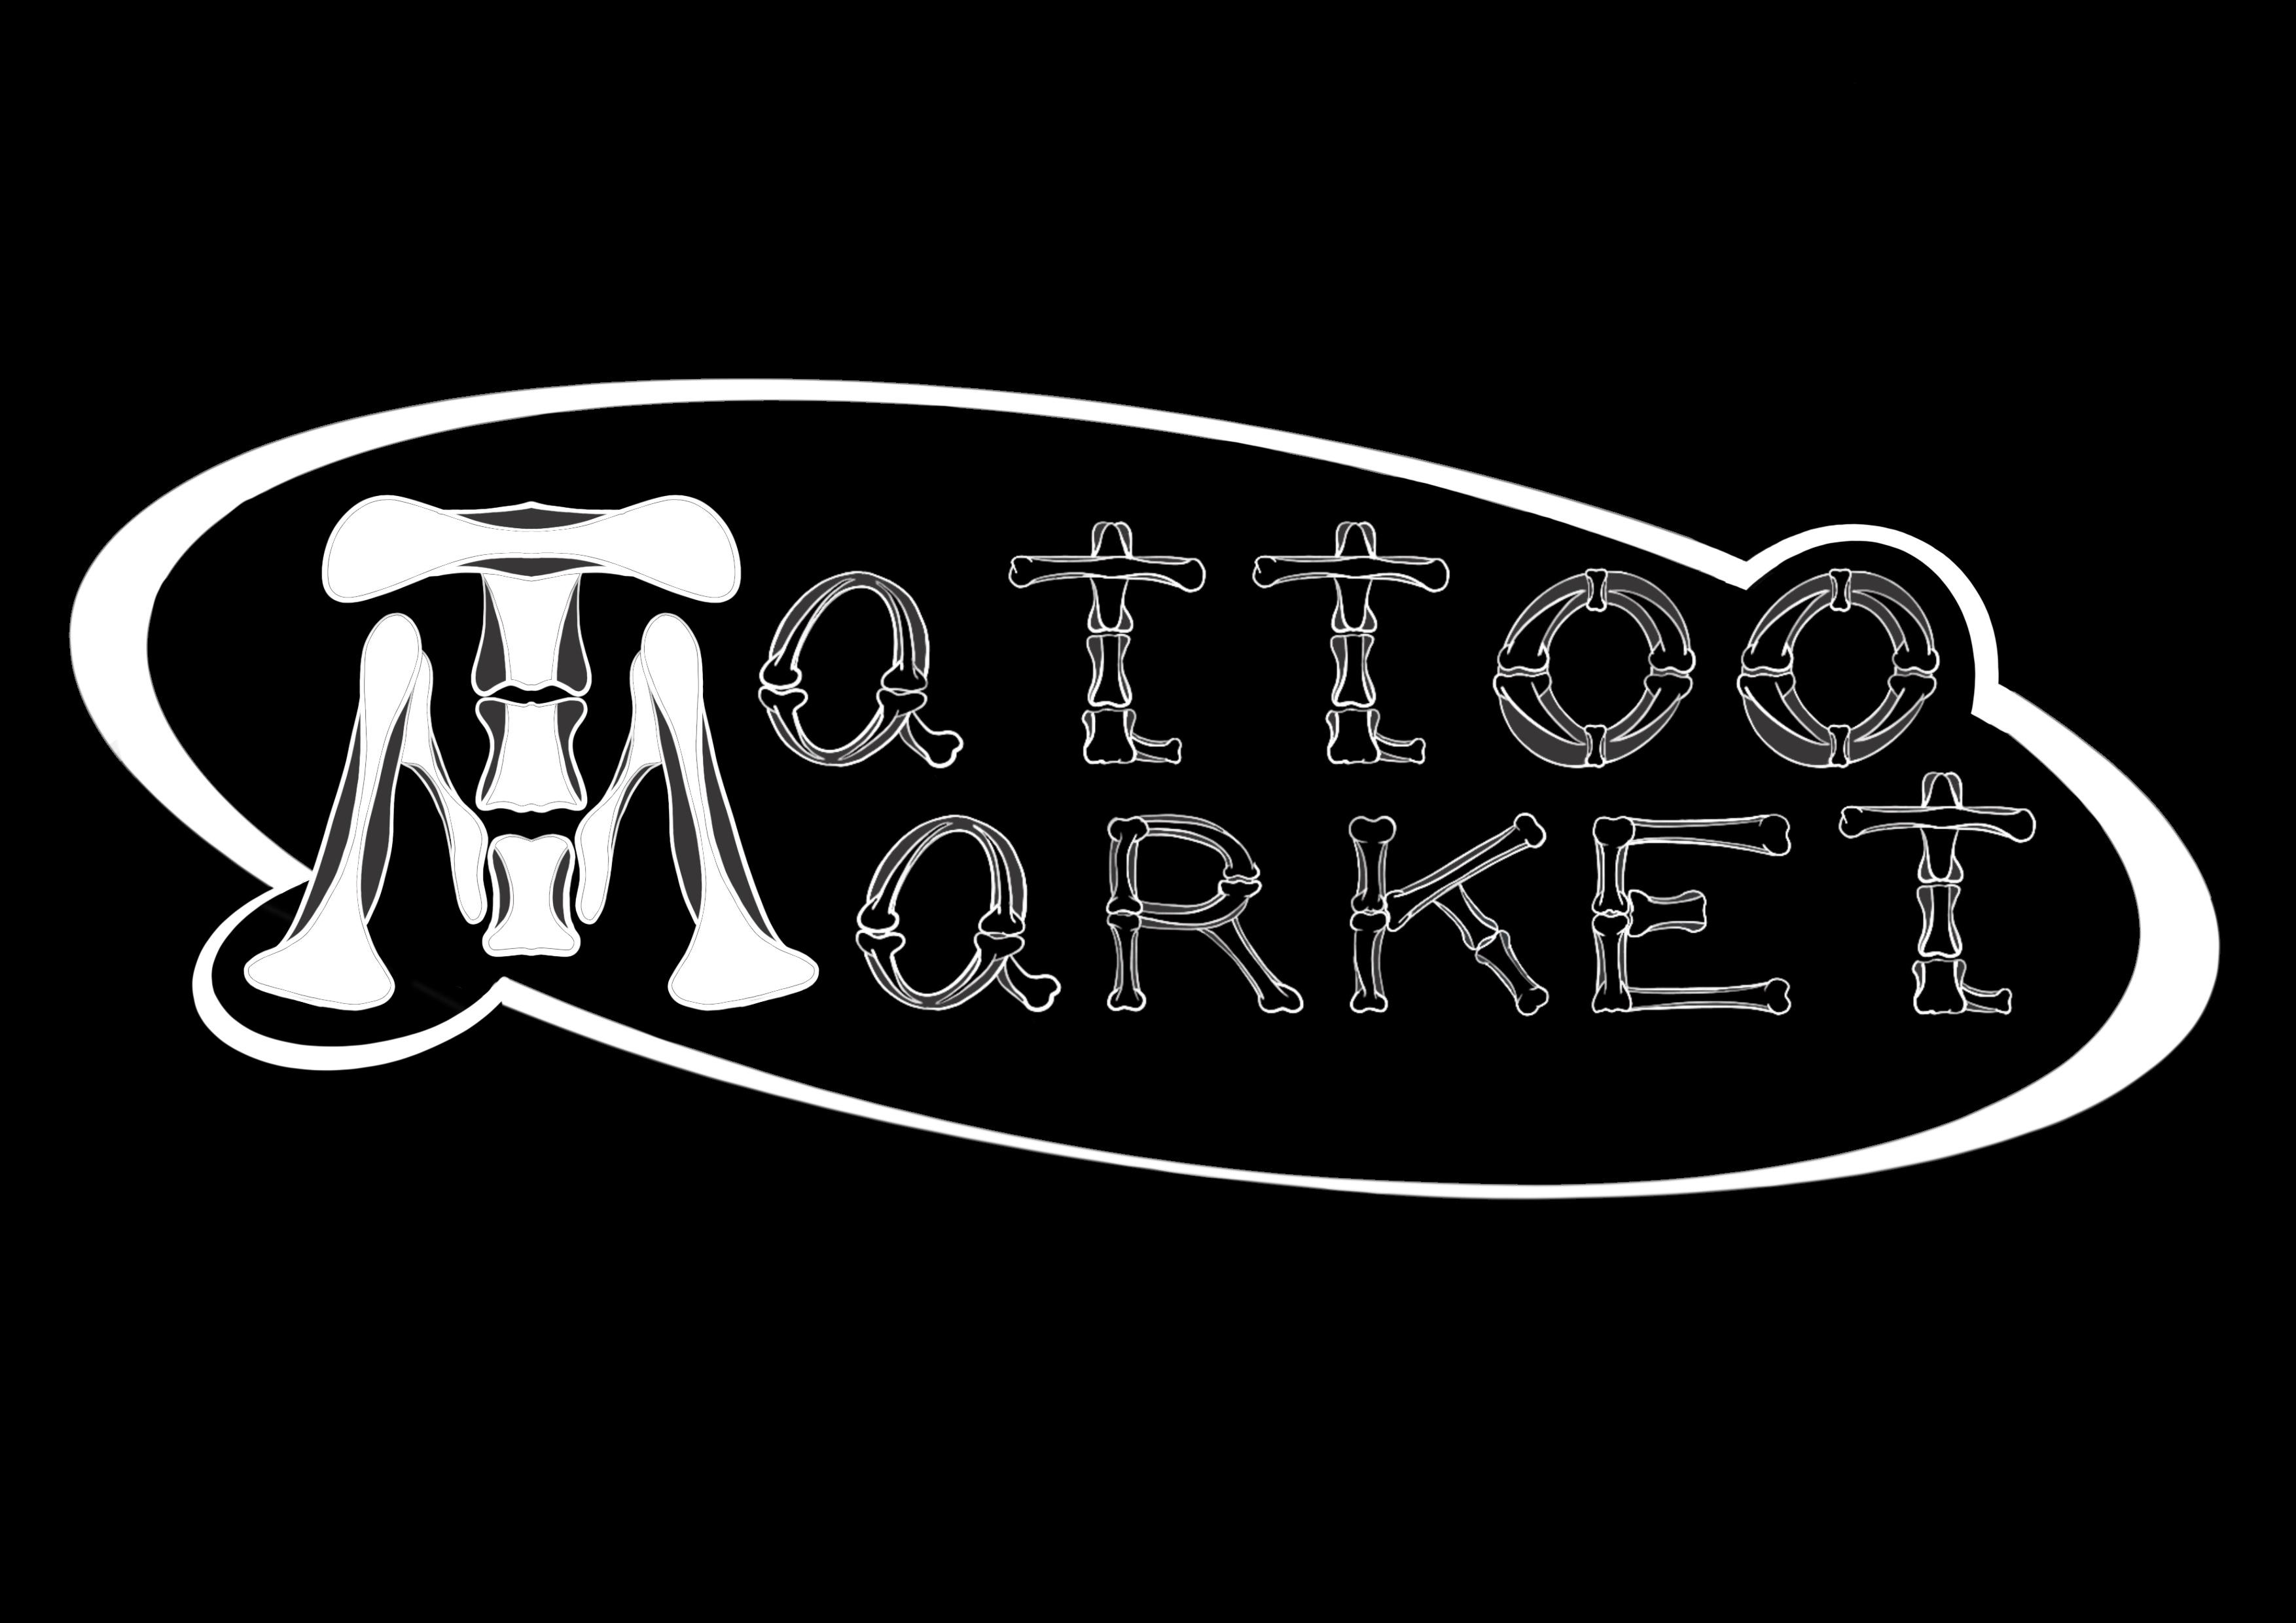 Редизайн логотипа магазина тату оборудования TattooMarket.ru фото f_7015c39ea43908b3.jpg